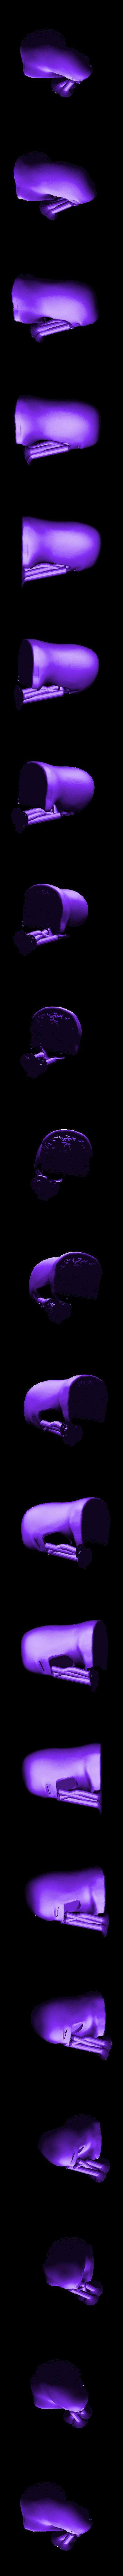 SG_FaceP_Head_Black.stl Download free STL file Space Ghost - Facepalm • 3D printable model, mag-net